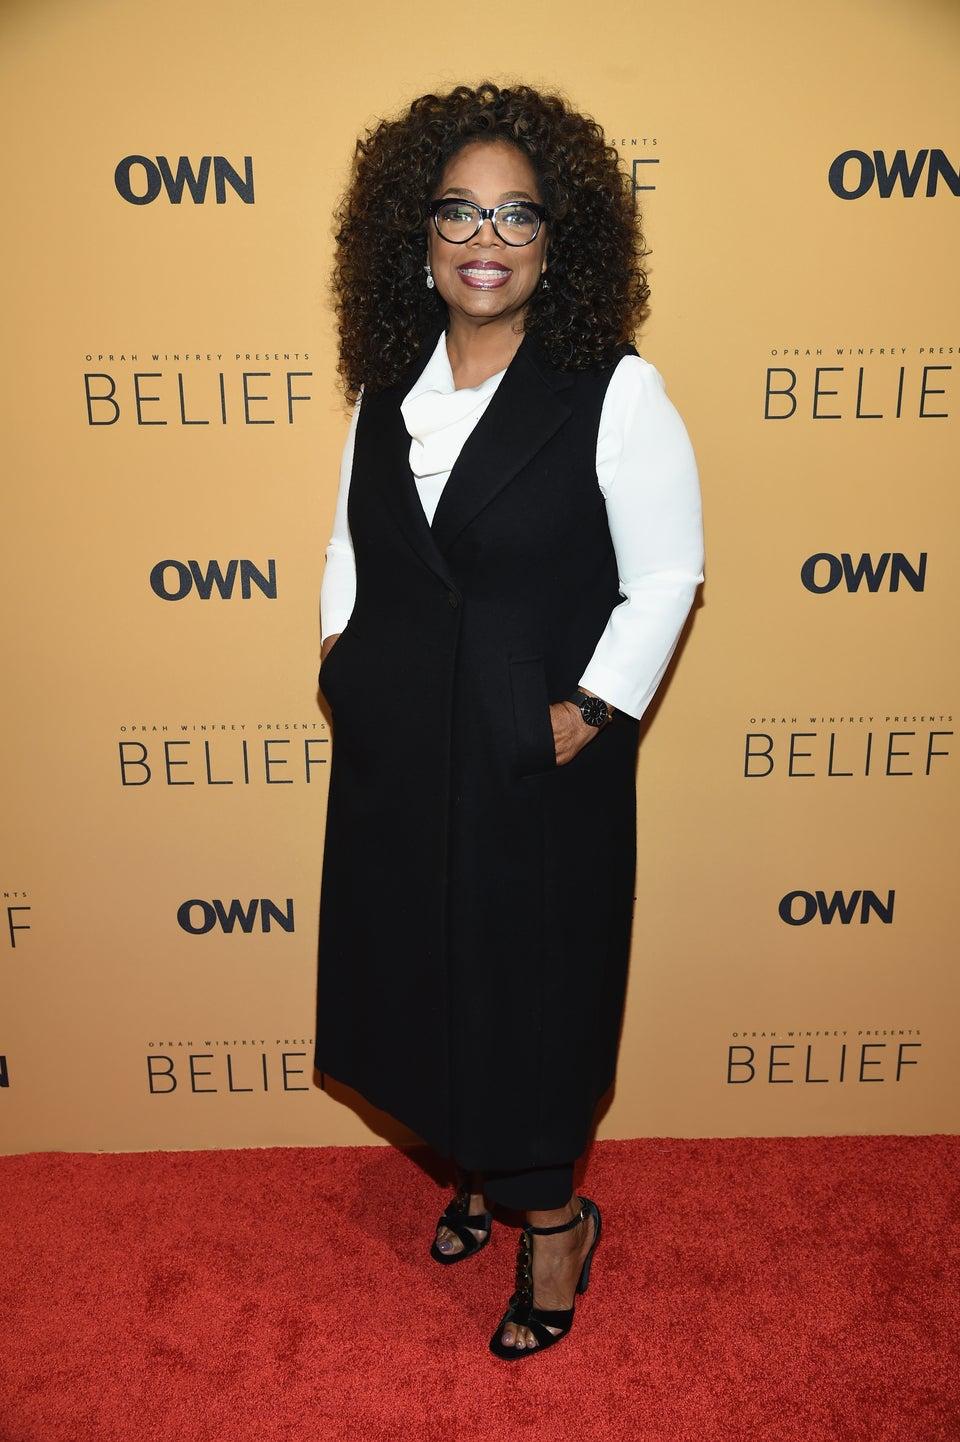 Oprah Winfrey Endorses Hillary Clinton for President